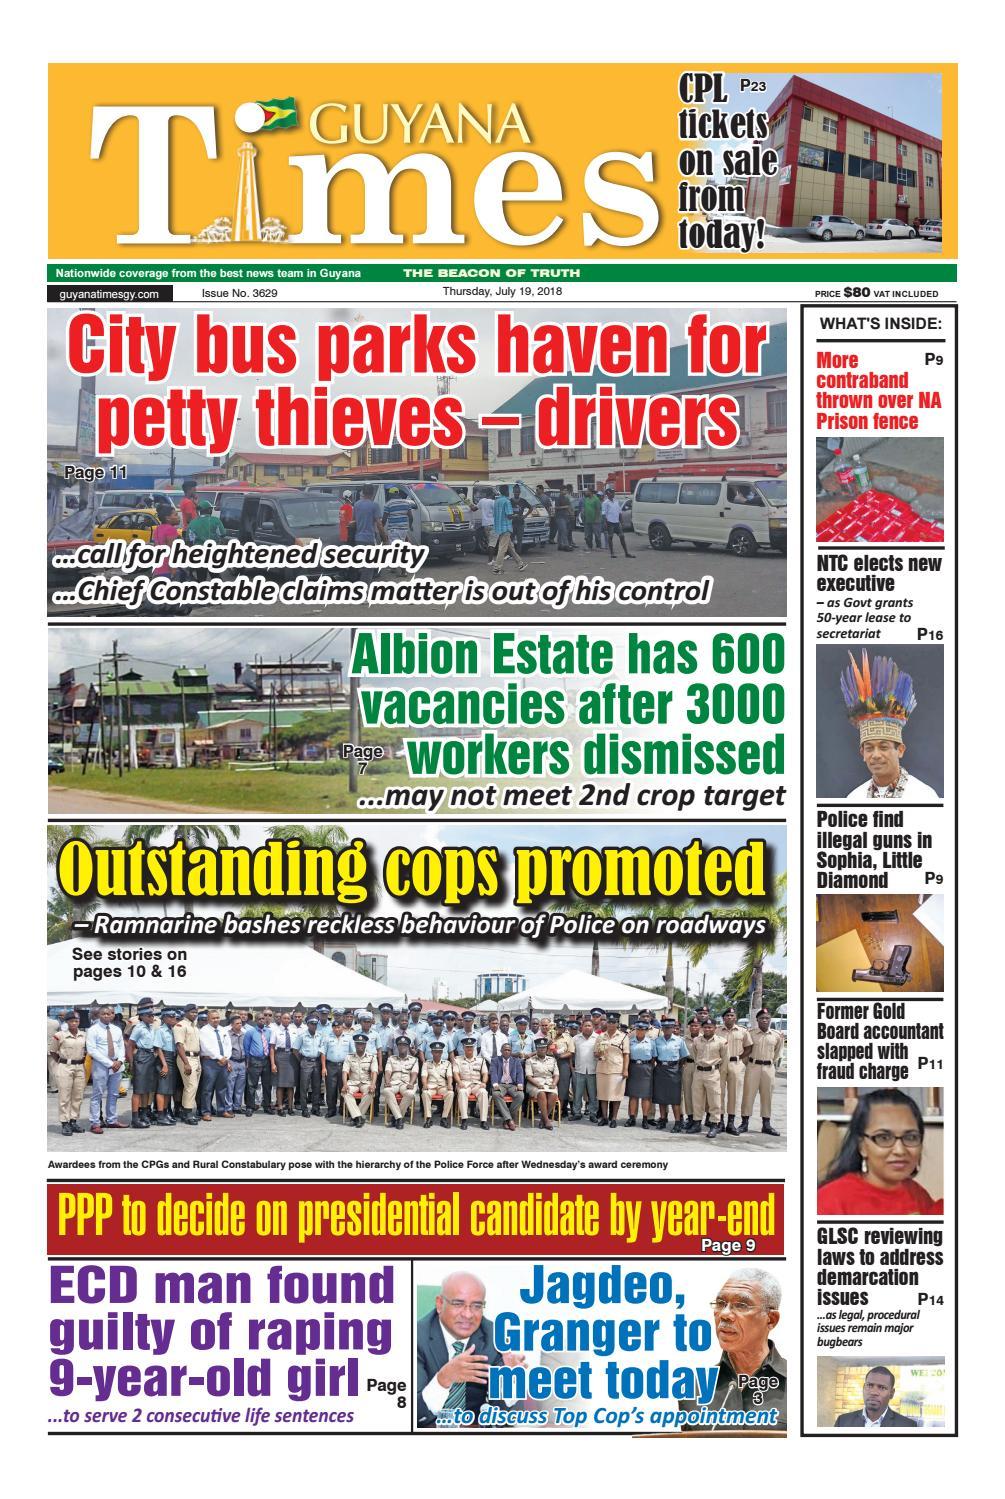 Promo Harga Cop Fbt Update 2018 Original Acf Ac 7206u Panel Bonding Perekat Cable Lcd Guyana Times Thursday July 19 By Gytimes Issuu